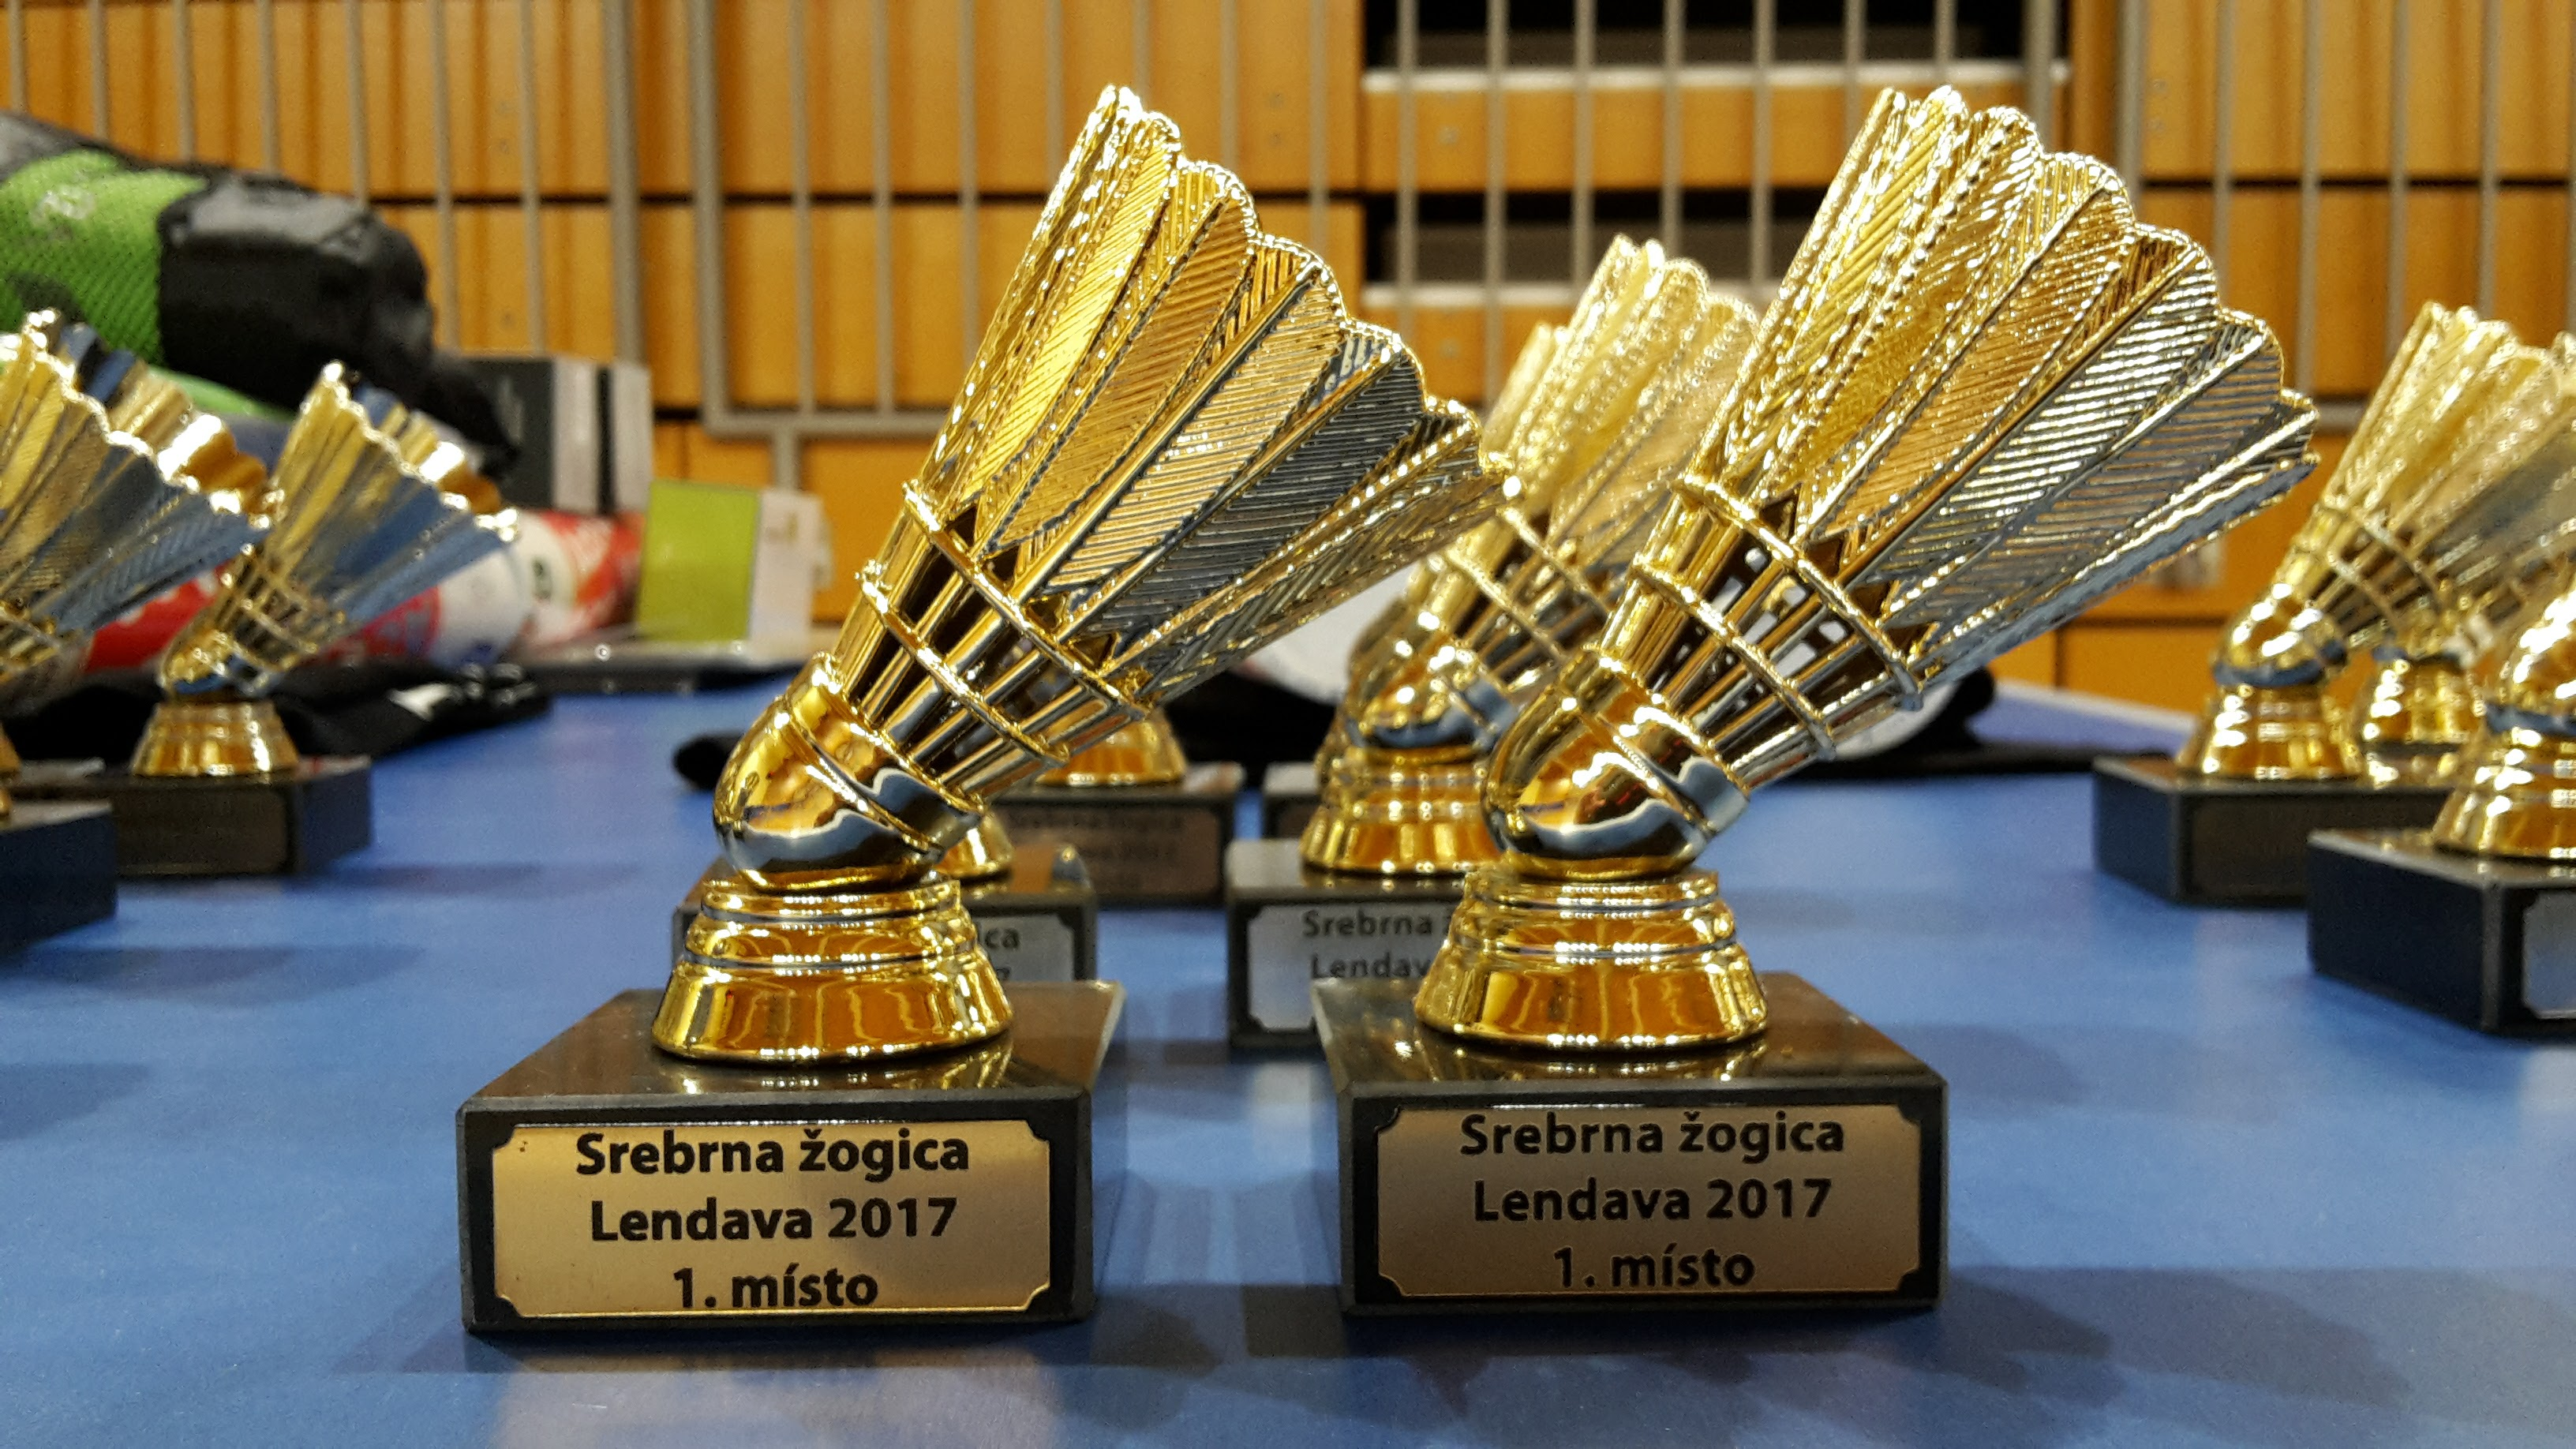 Zmagovalci - The Winners